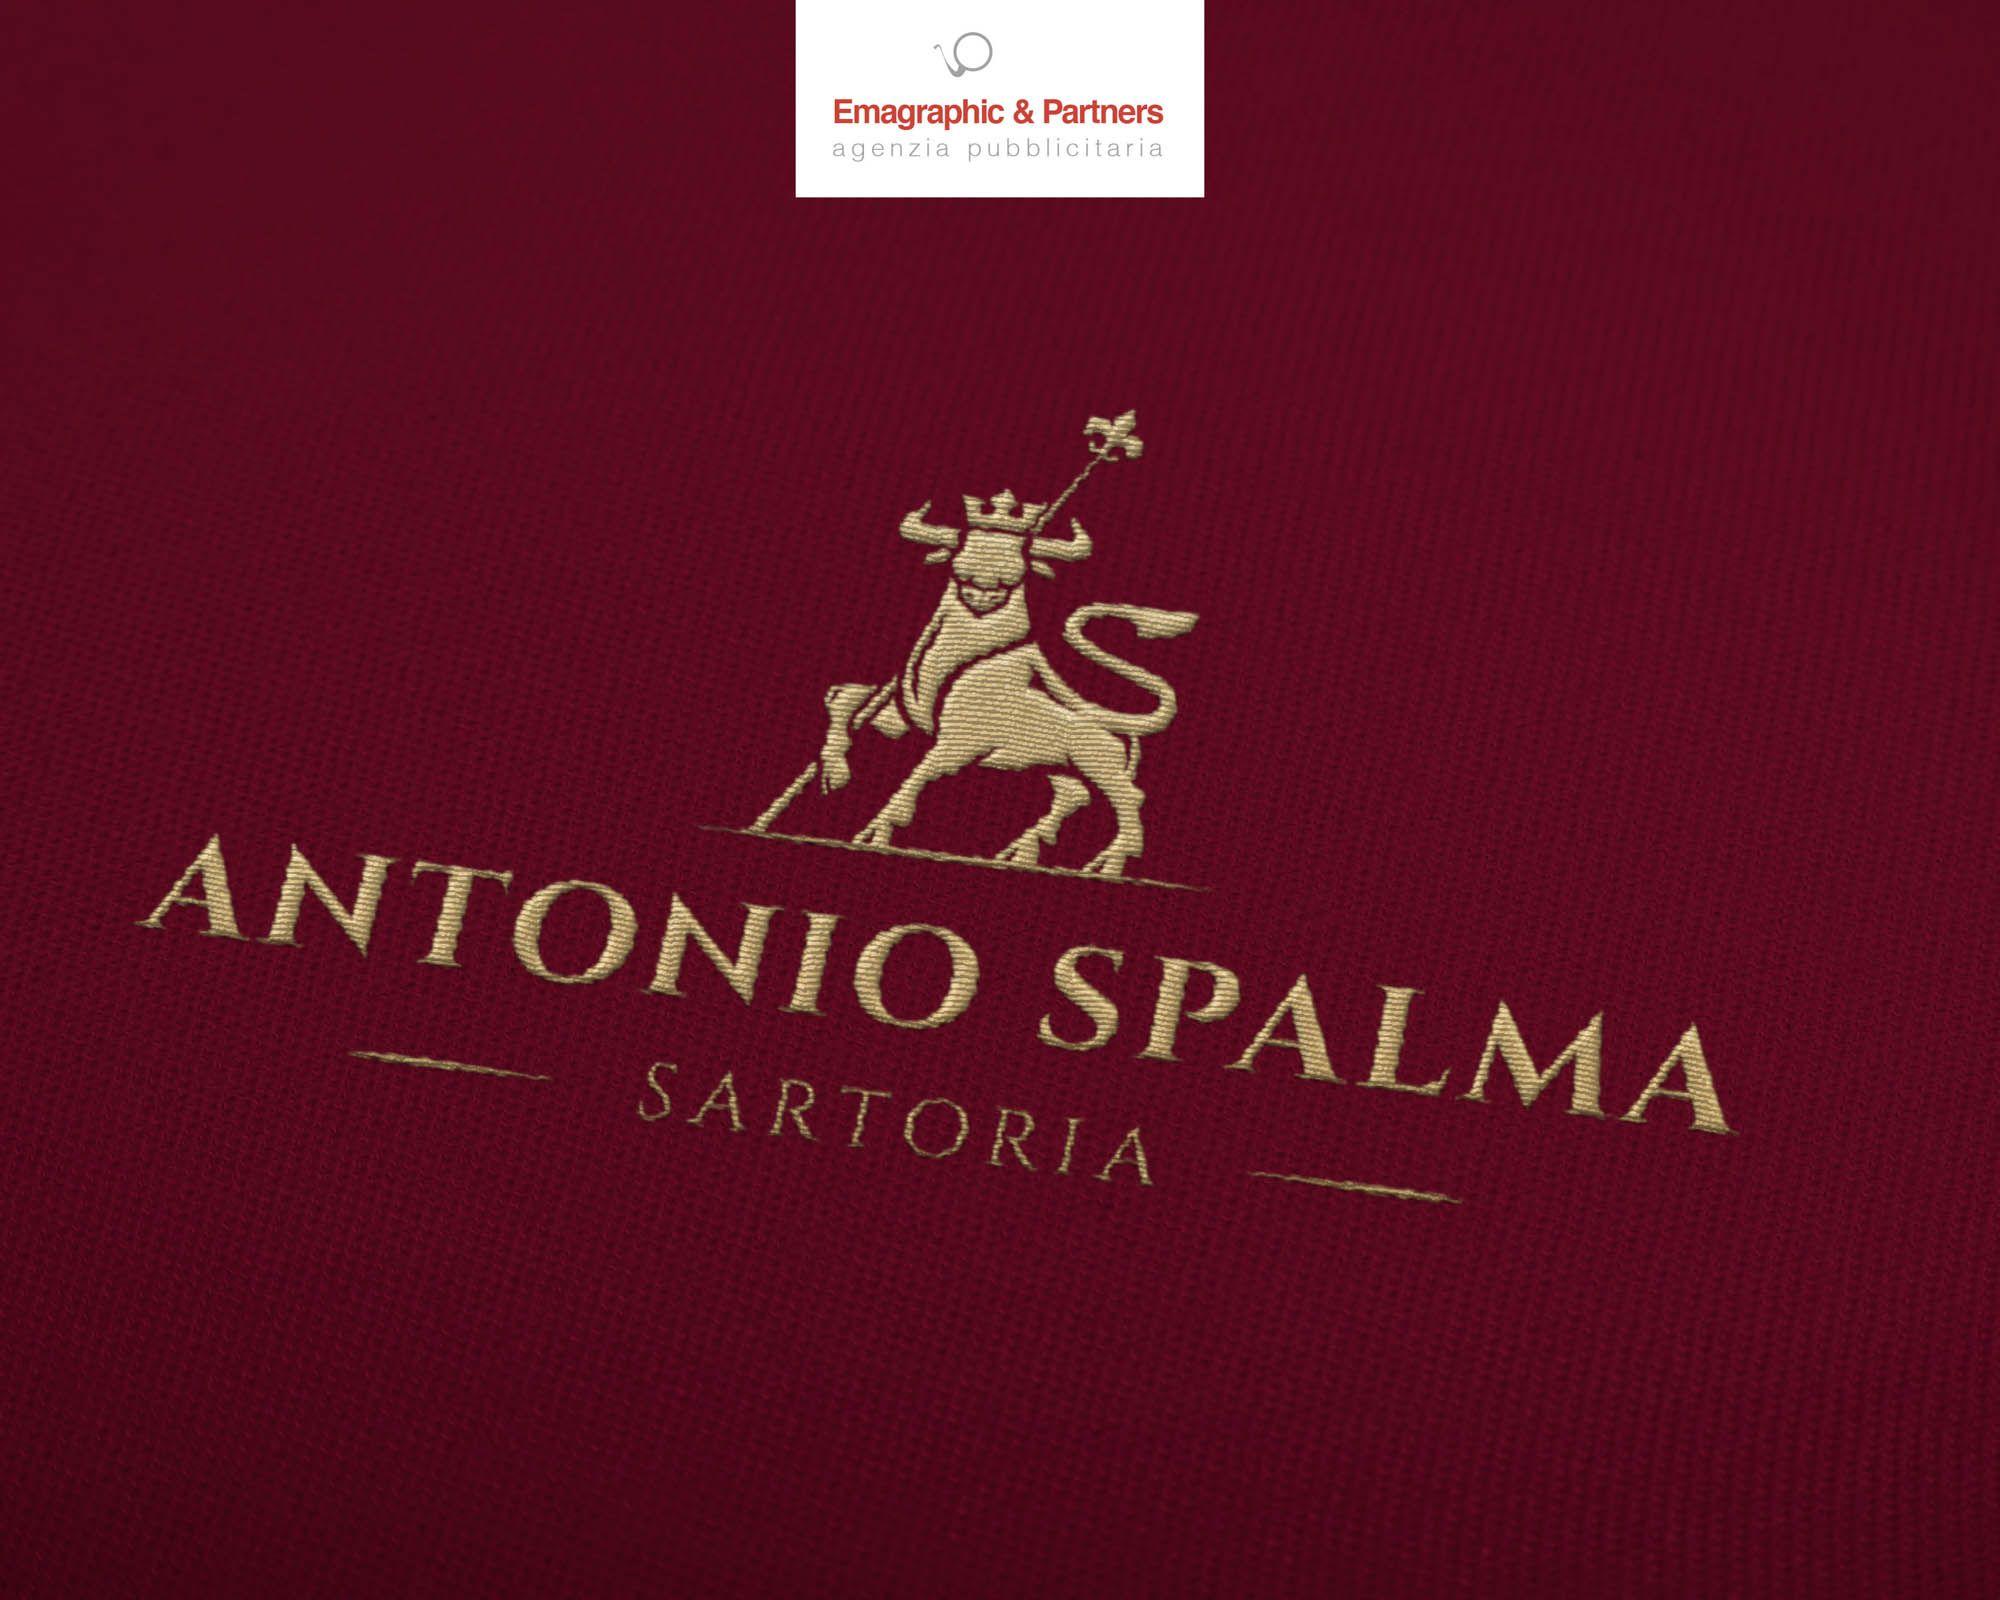 Logo-e-immagine-coordinata-Sartoria-Spalma-1